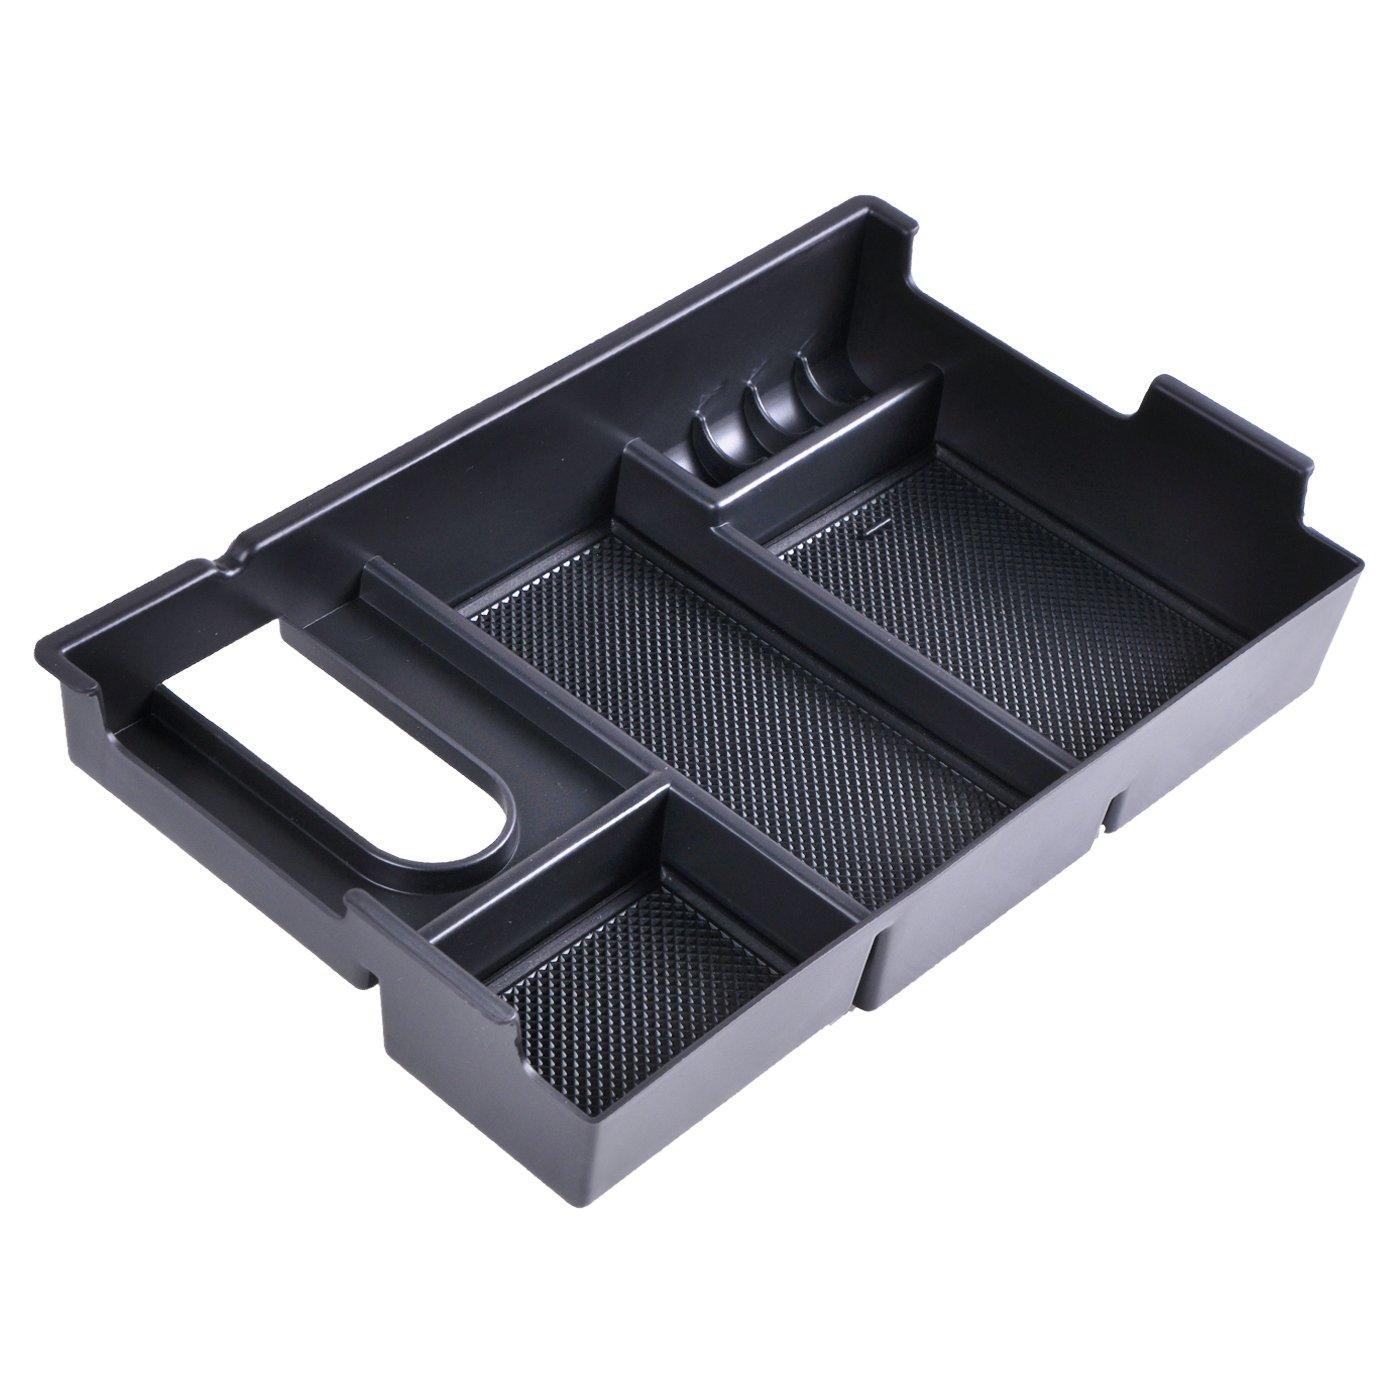 OMOTOR Center Console Insert Organizer Tray Armrest Box Glove Box Storage For Toyota (Toyota Tundra 2014-2018)